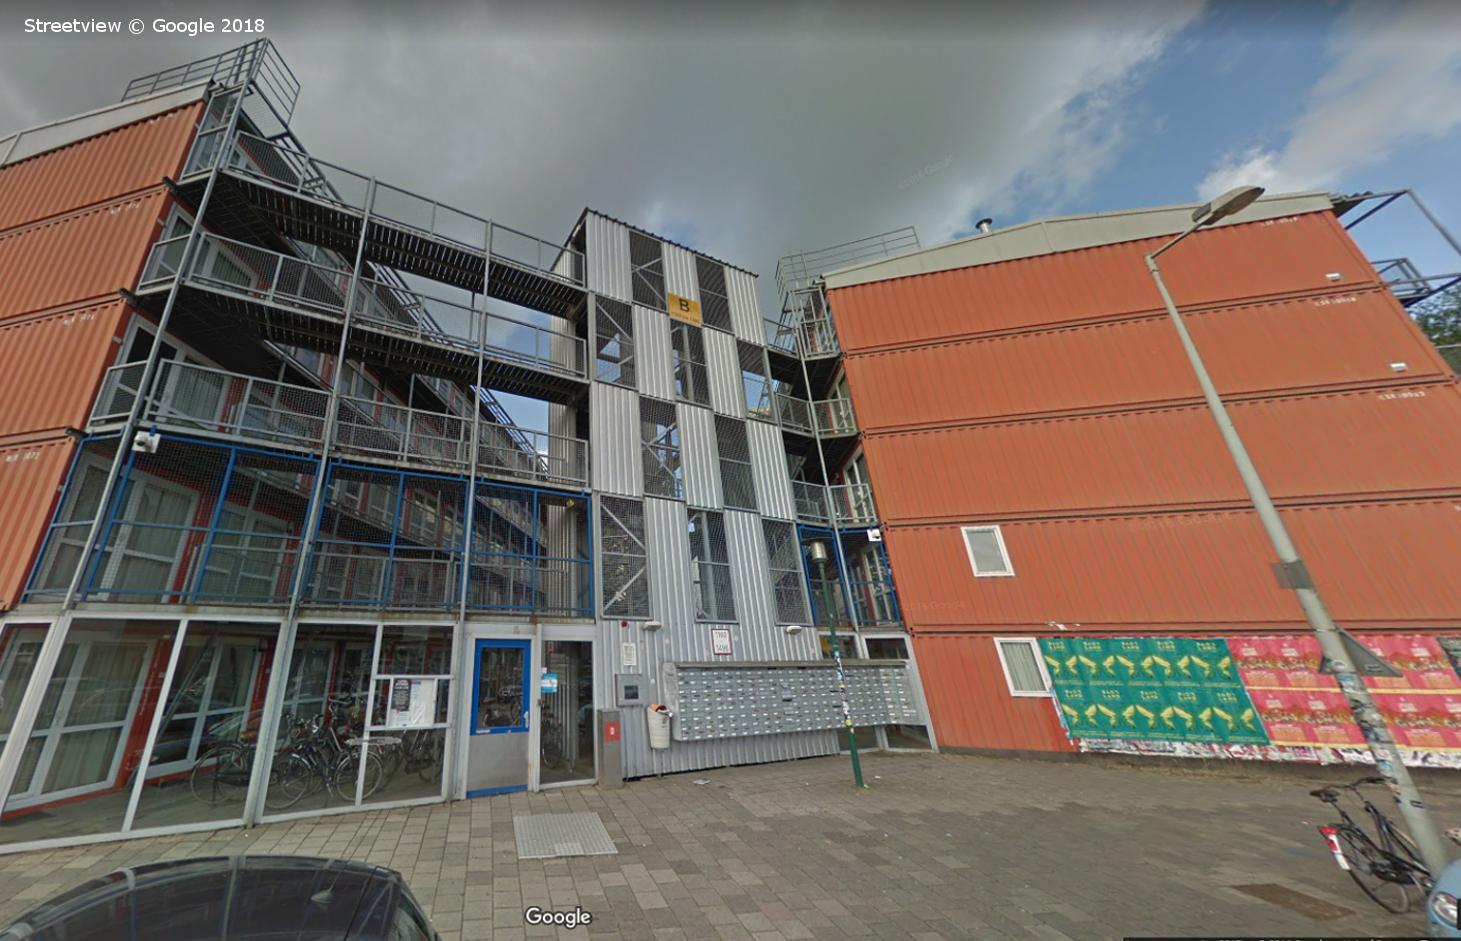 Keetwonen Student Apartments, Amsterdam, Google Streetview